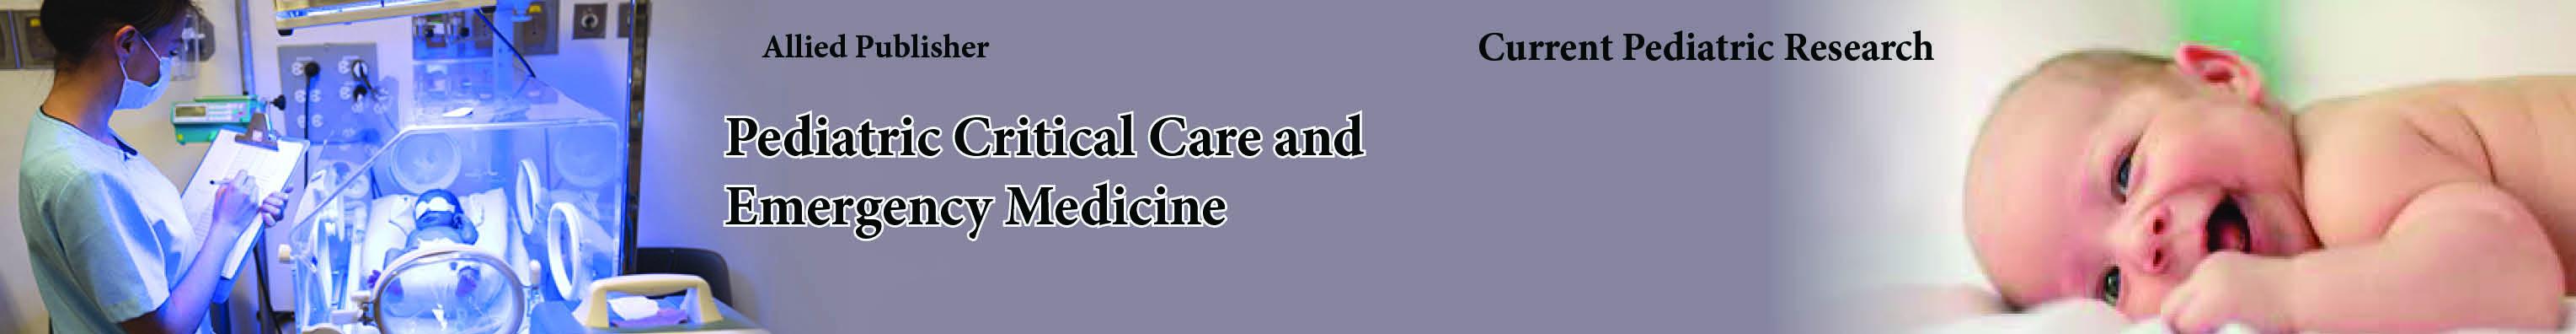 362-pediatric-critical-care-and-emergency-medicine.jpg